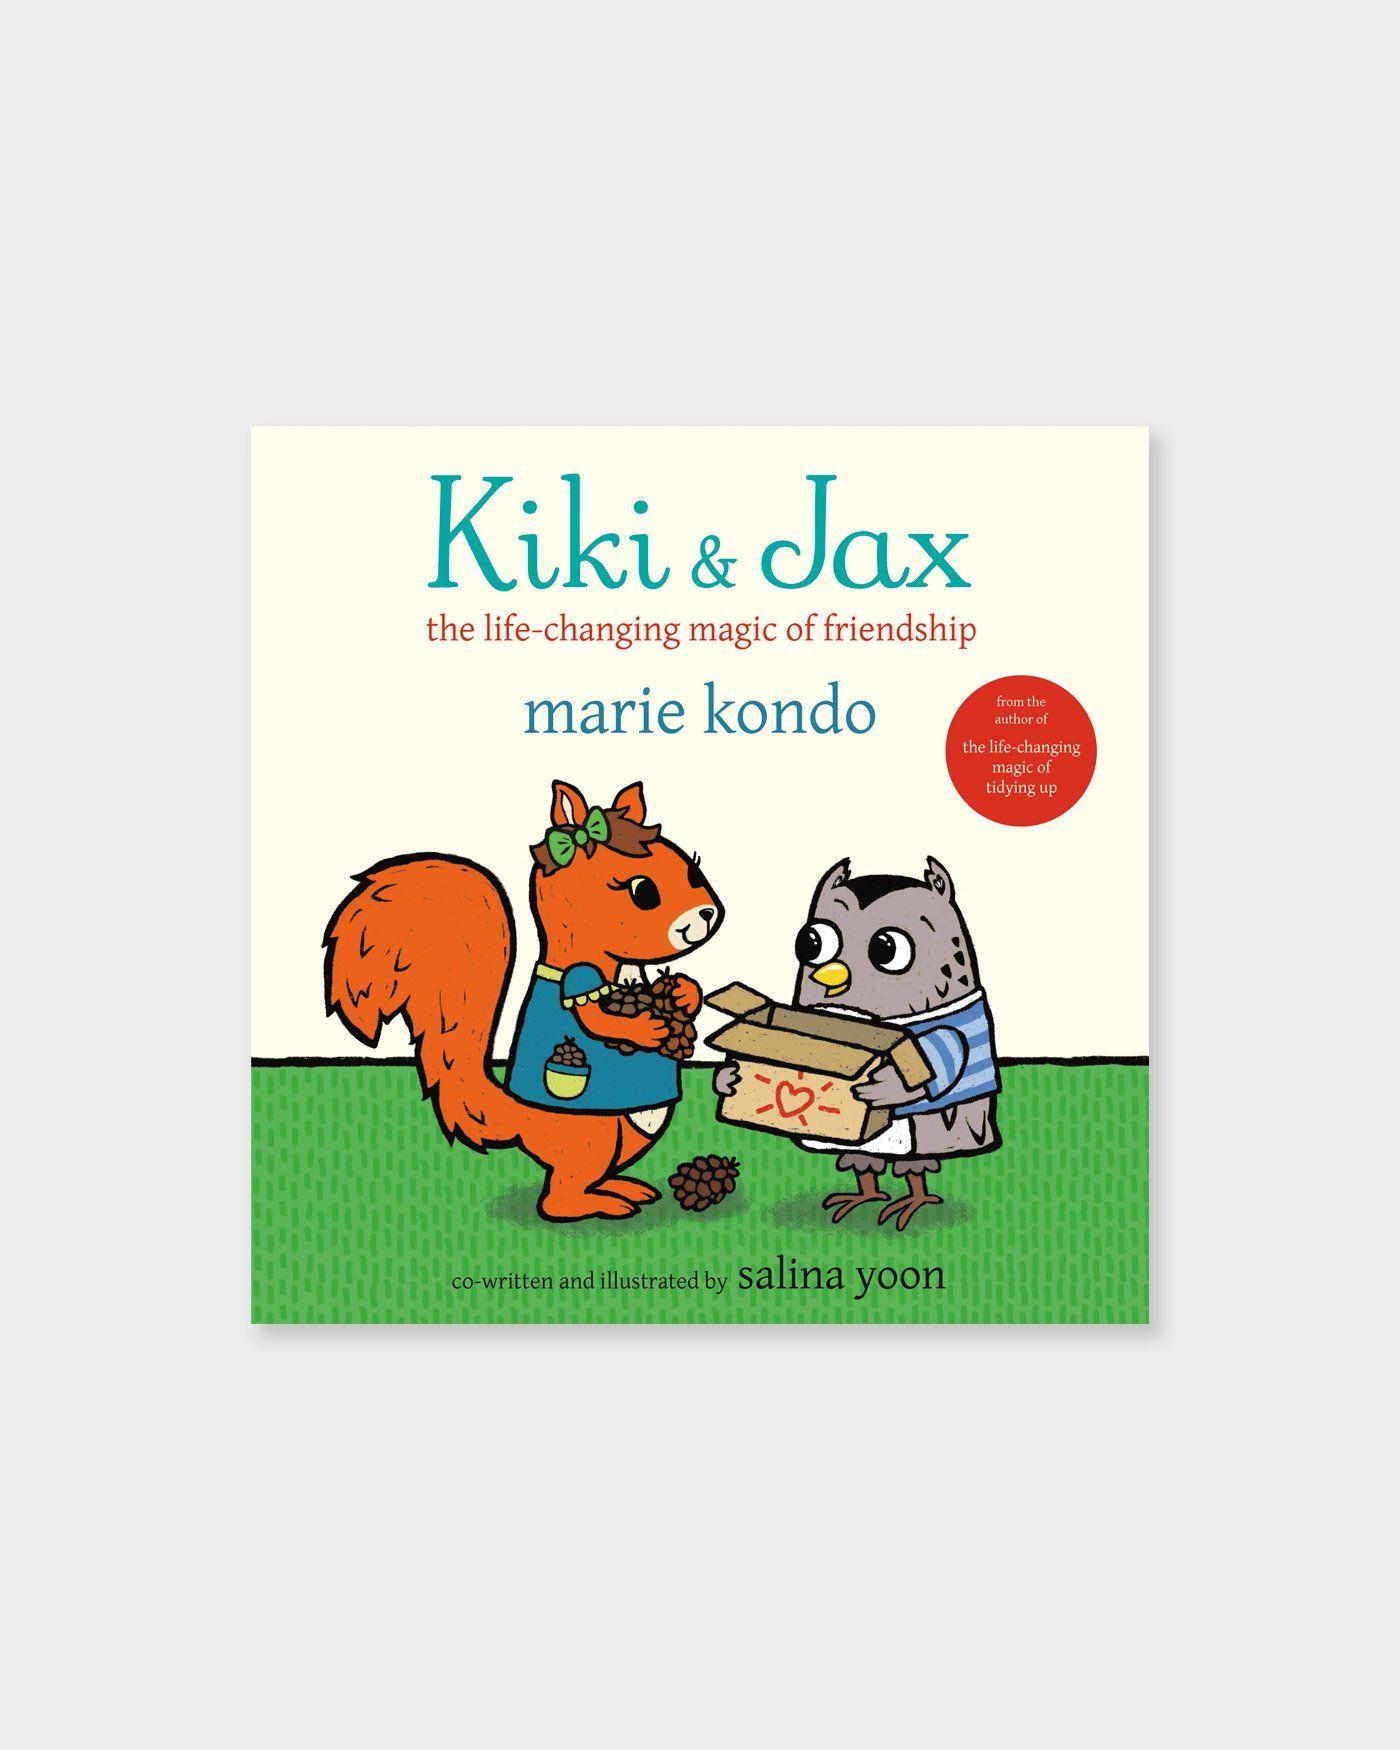 Kiki jax the lifechanging magic of friendship